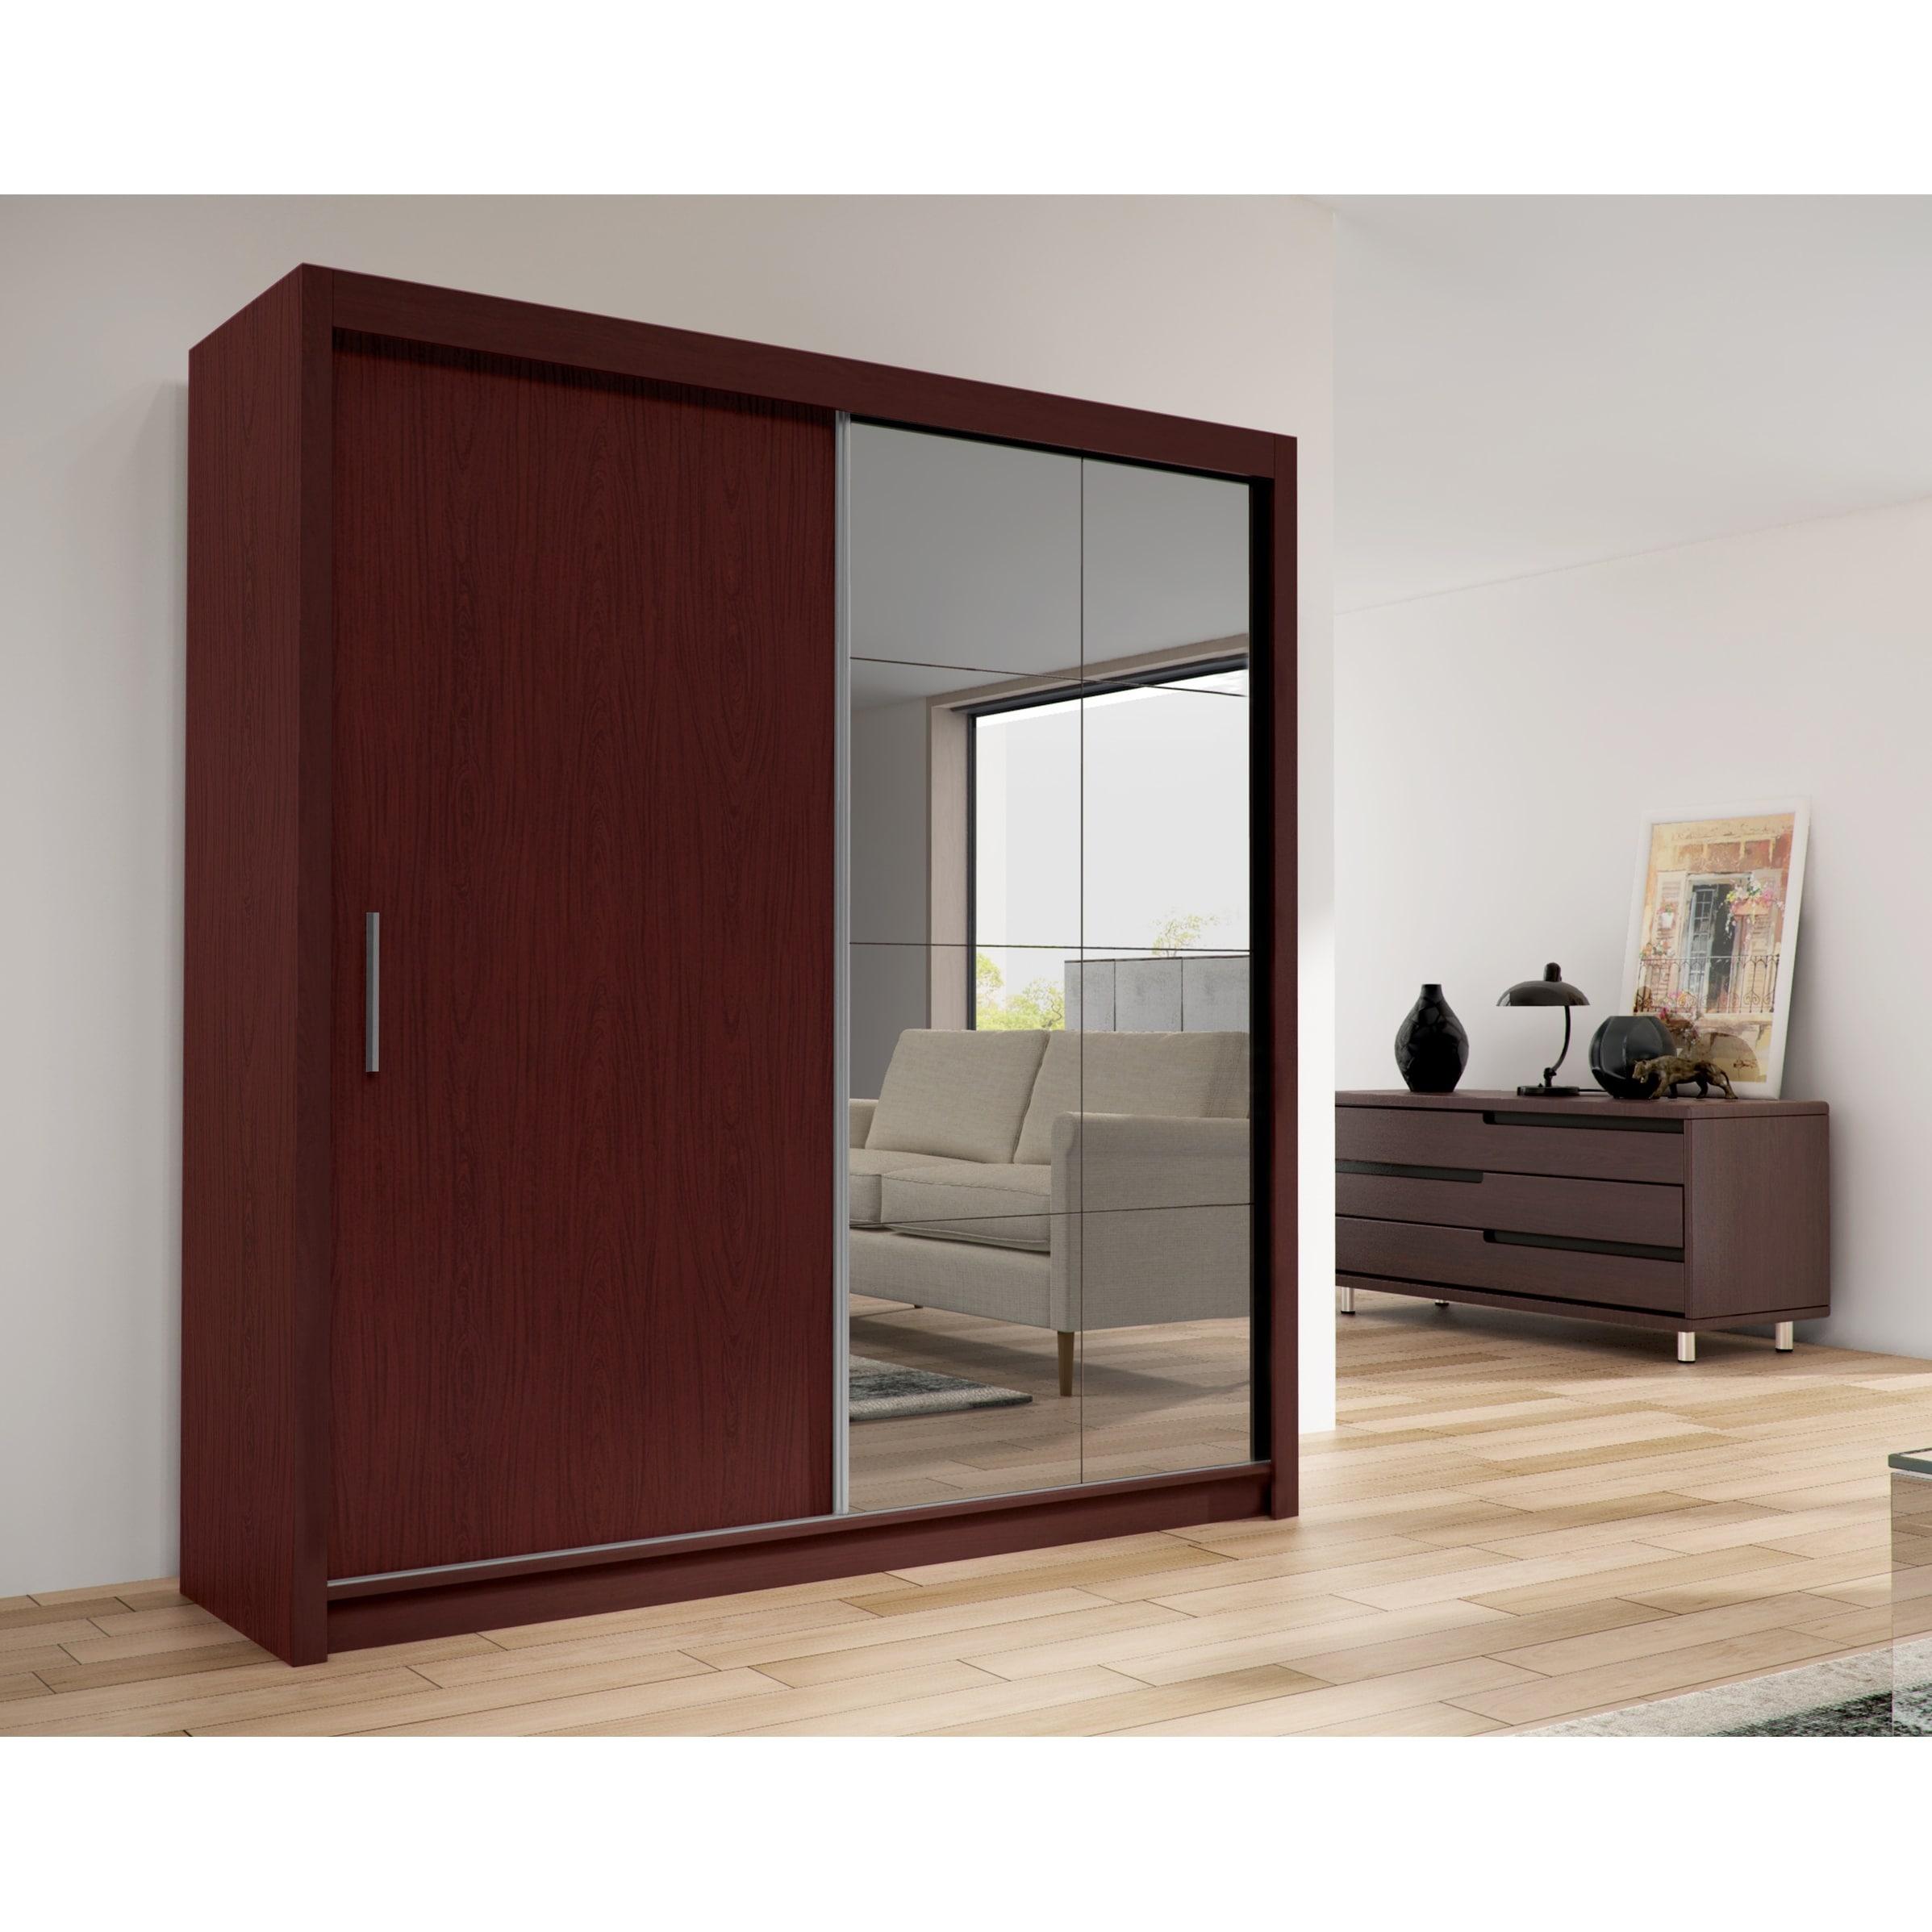 Shop Cedar 2 Door Solid Wood Modern Wardrobe Armoire With Mirror Espresso 59 Wide N A Overstock 30860325